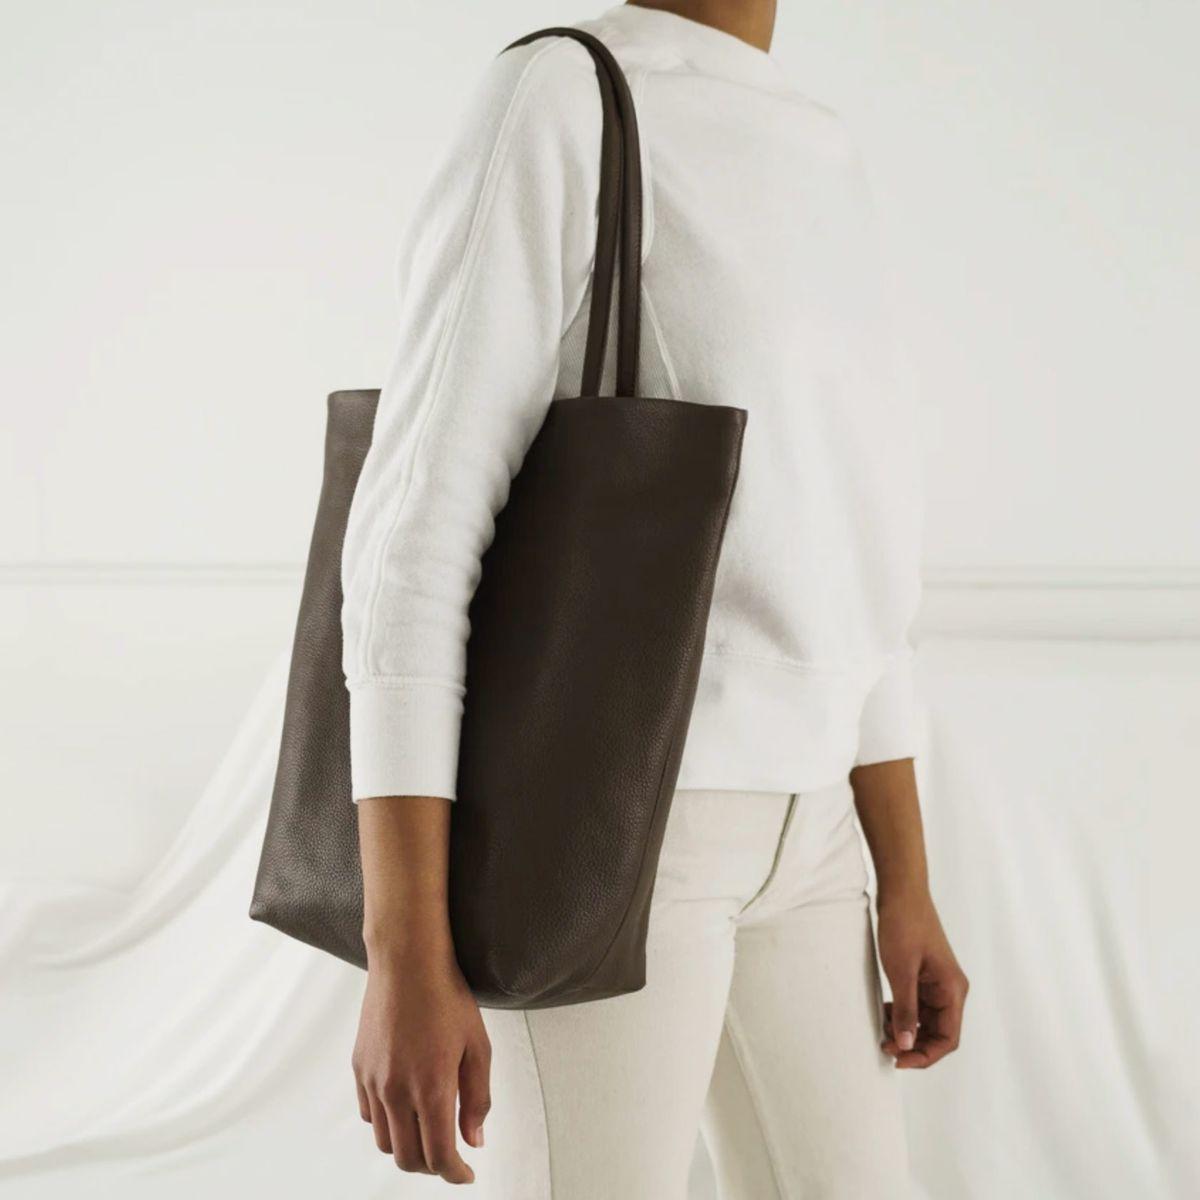 30 Best Work Bags Work Bags For Women 2021 The Strategist New York Magazine